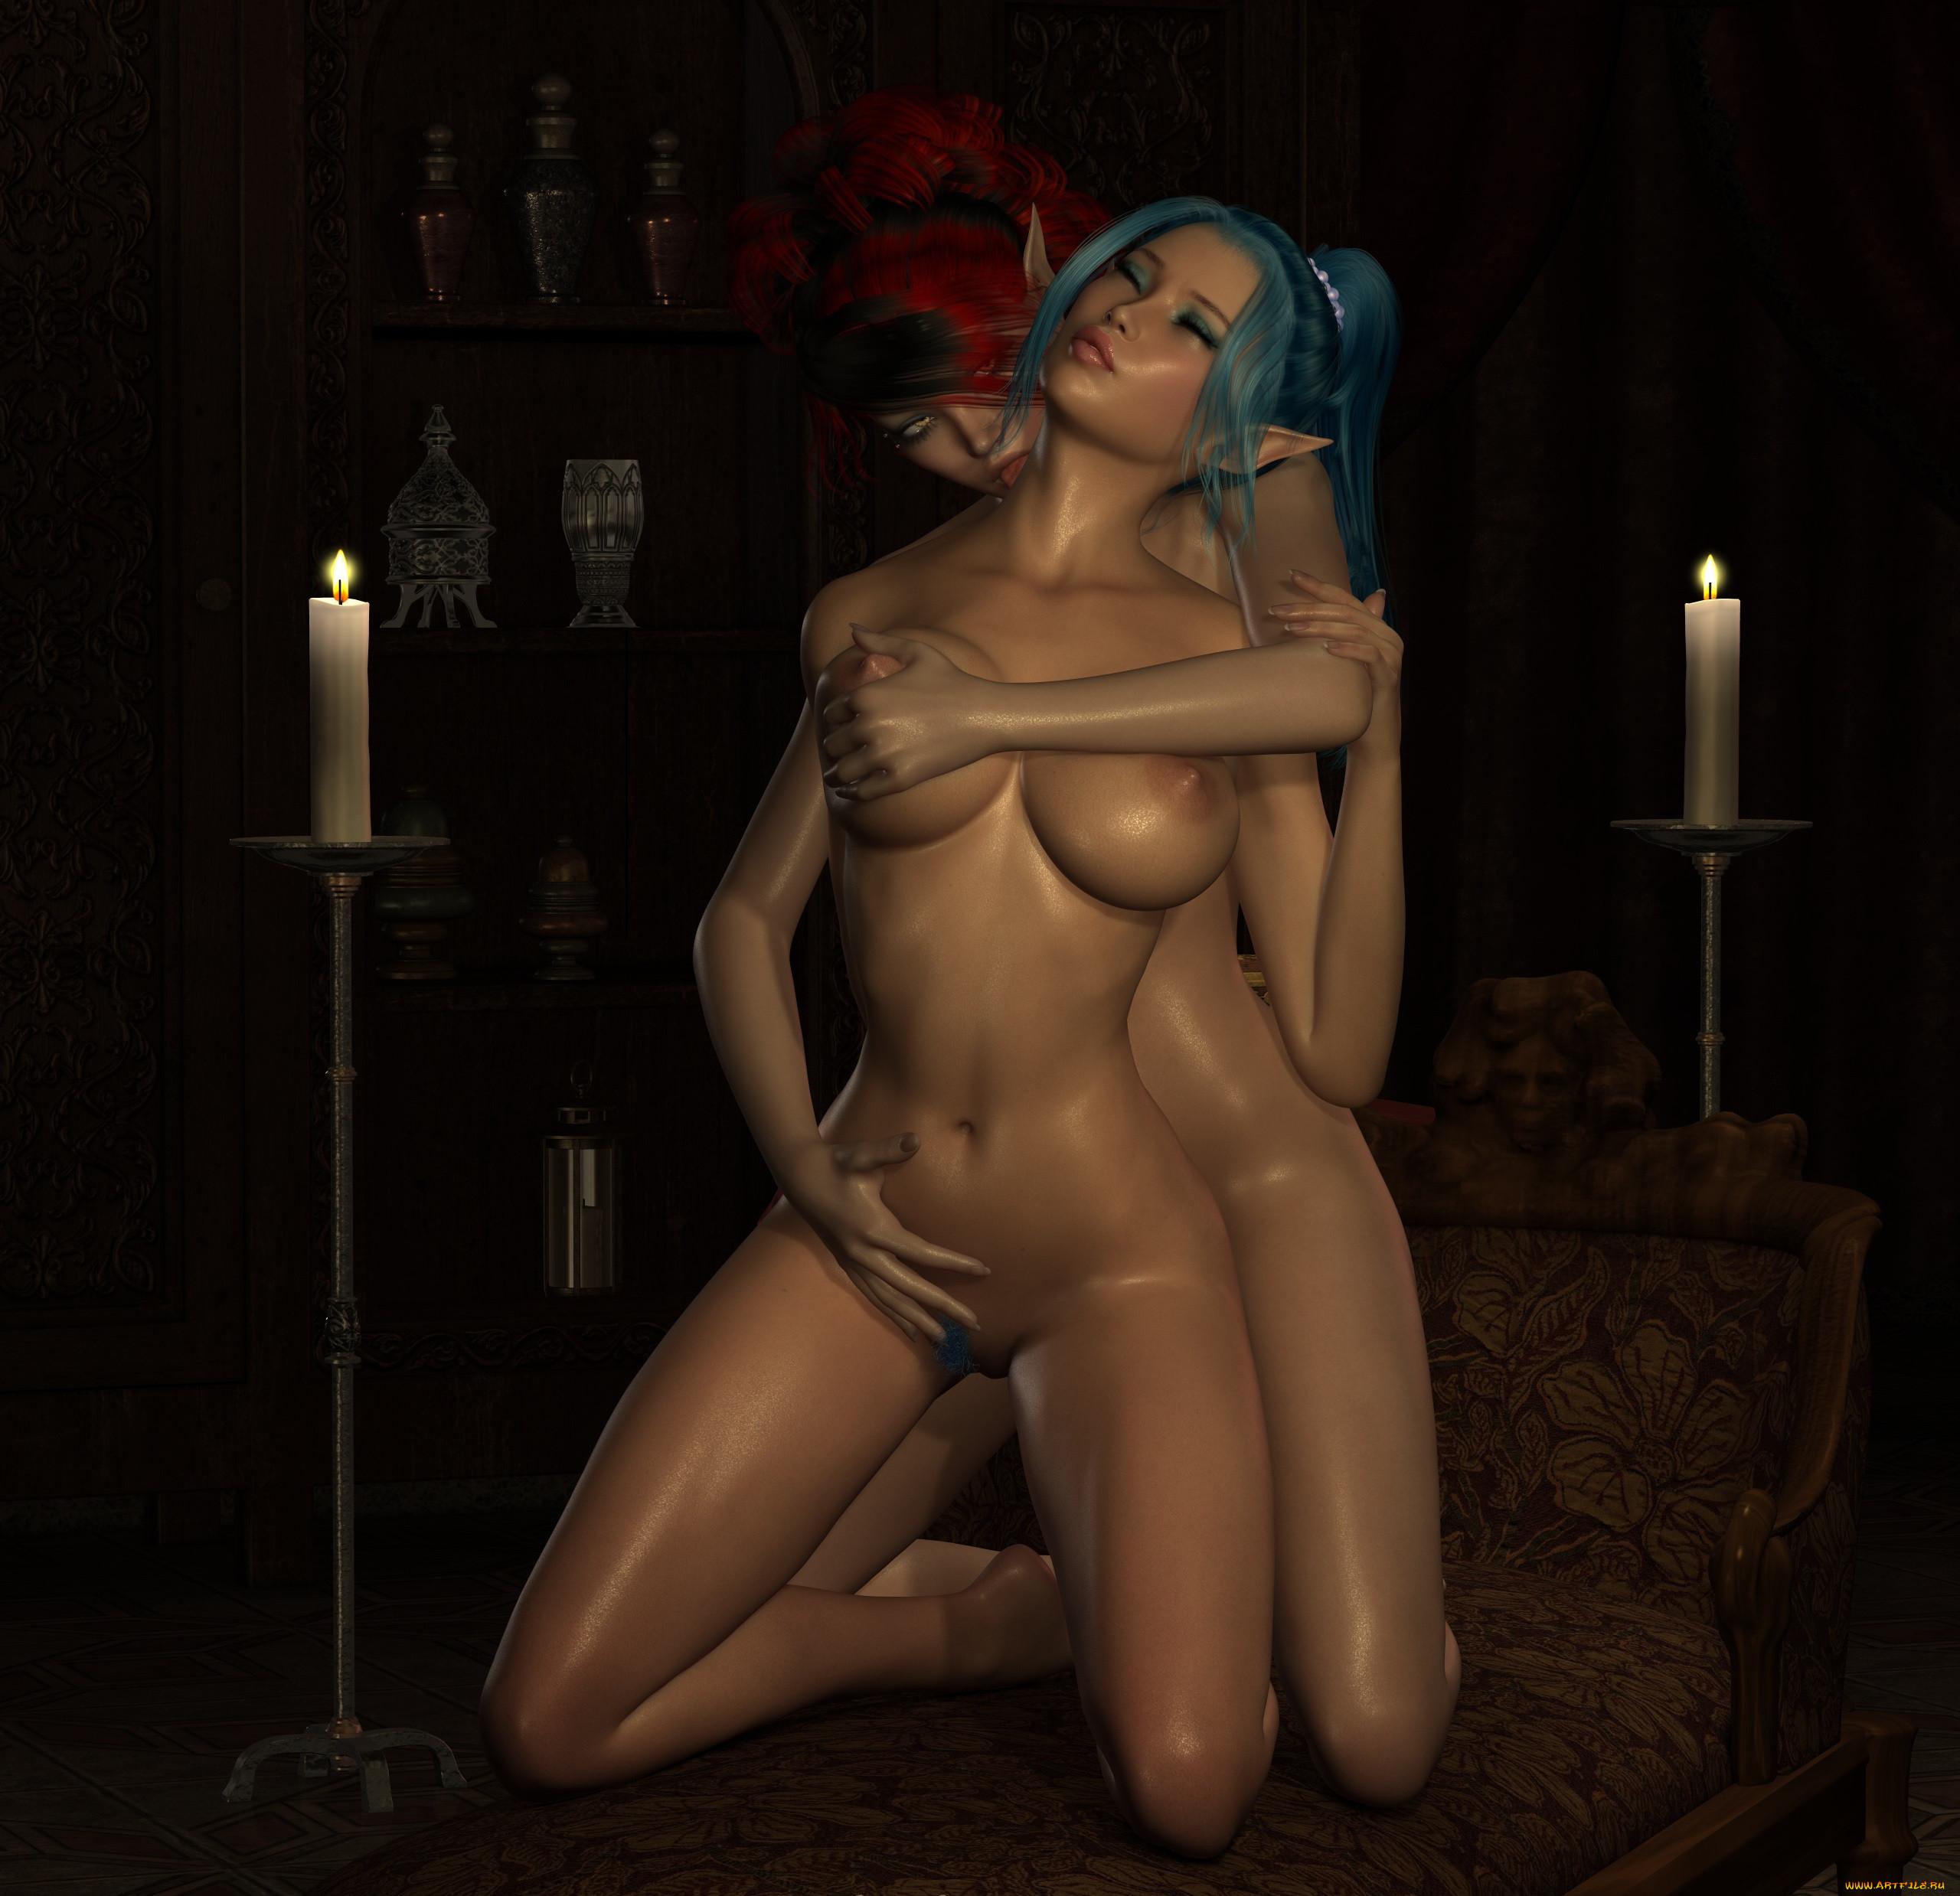 Порно арт голая эльфийка фото 780-51